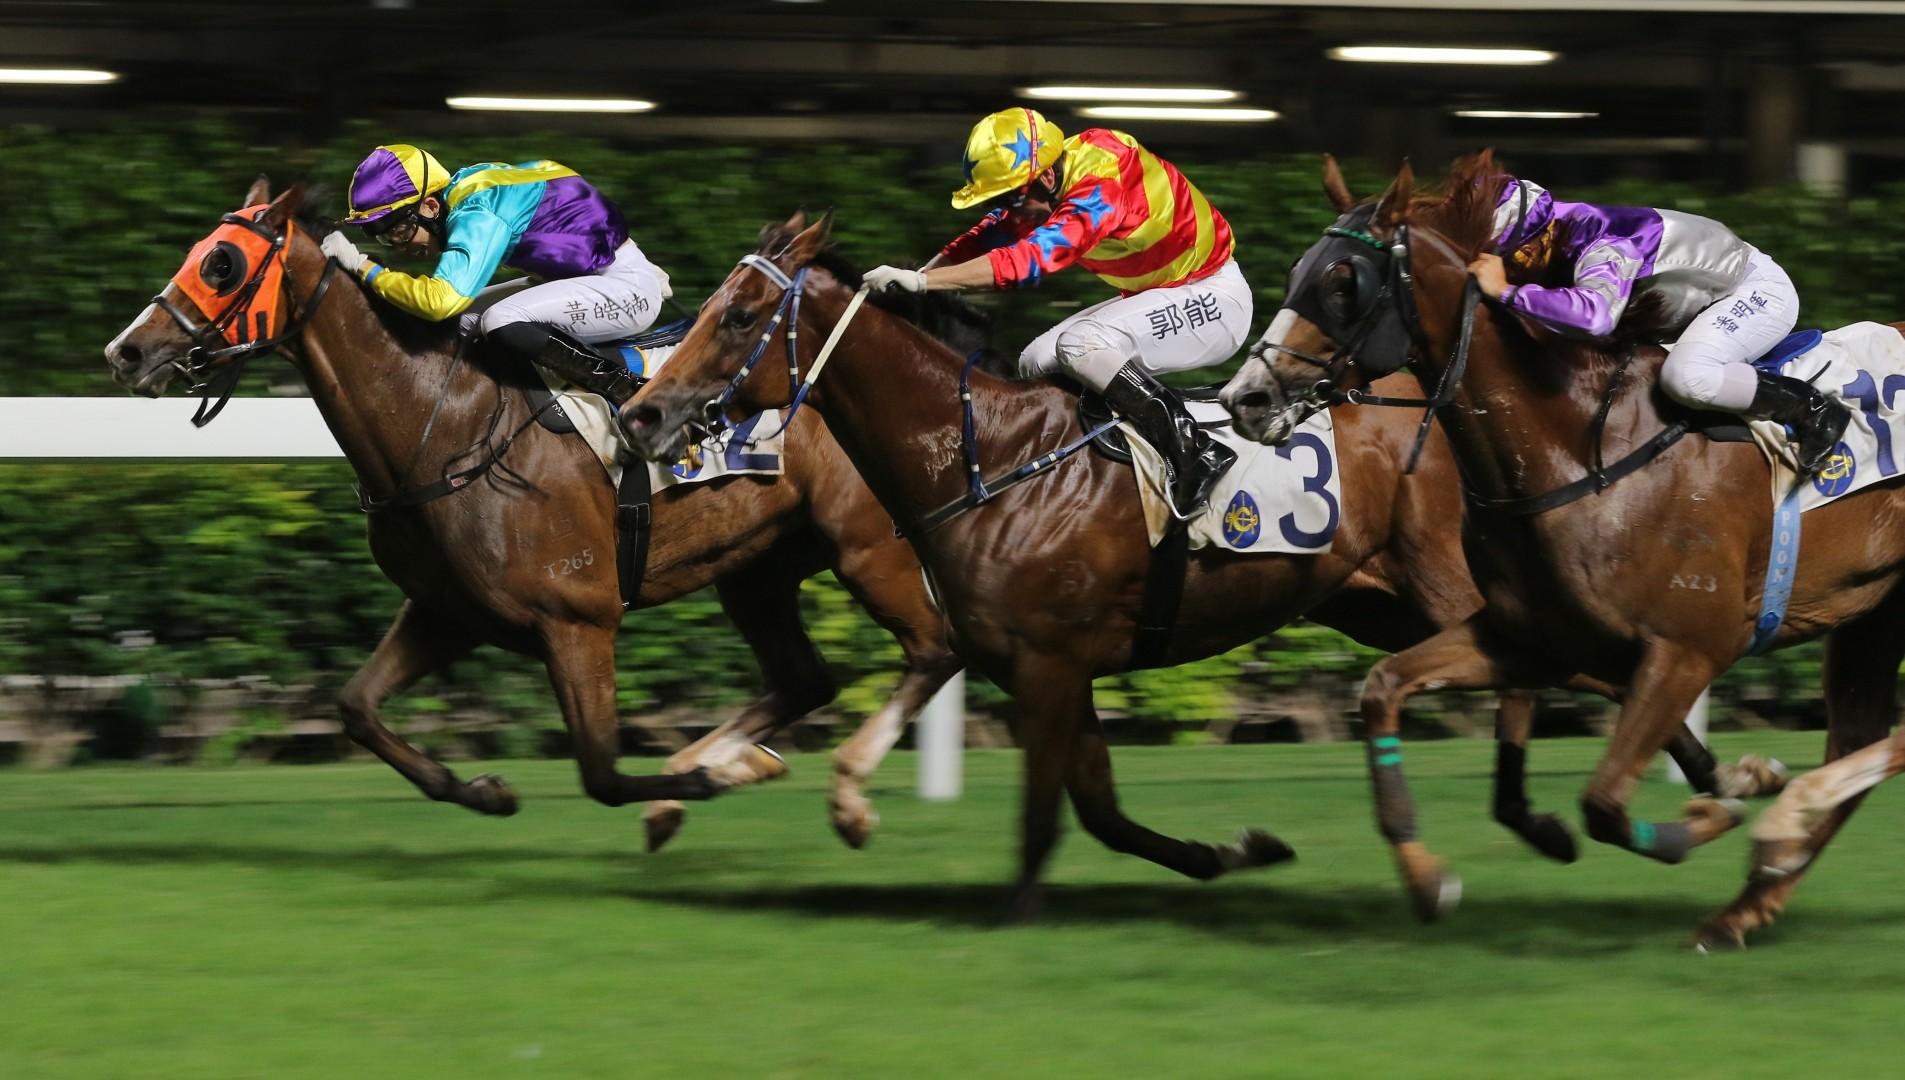 041eaf9b9f7c How an American gambler unlocked the secret to Hong Kong horse racing